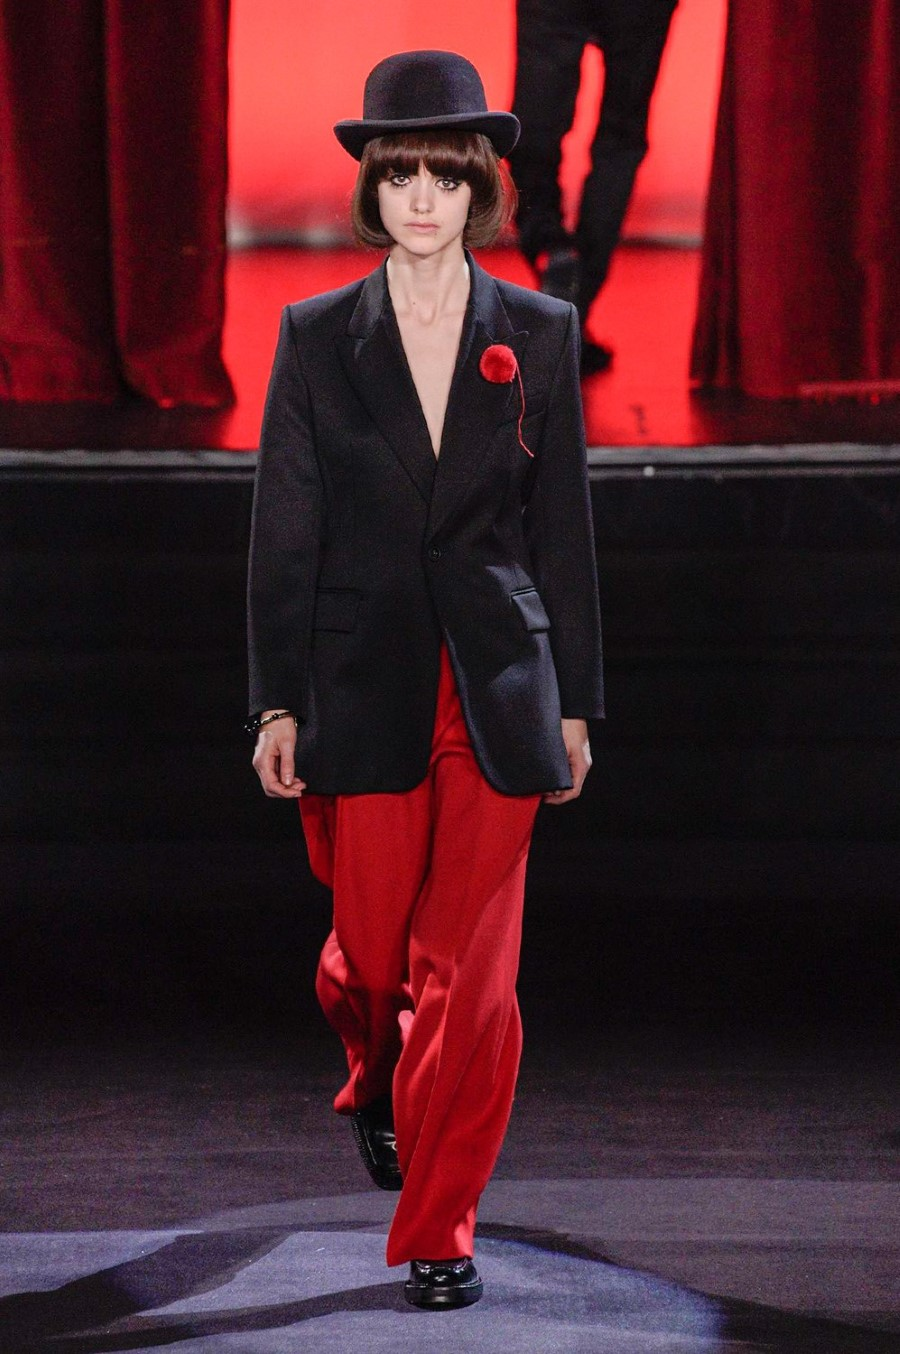 AMI Alexandre Mattiussi Fall Winter 2020 - Paris Fashion Week Men's